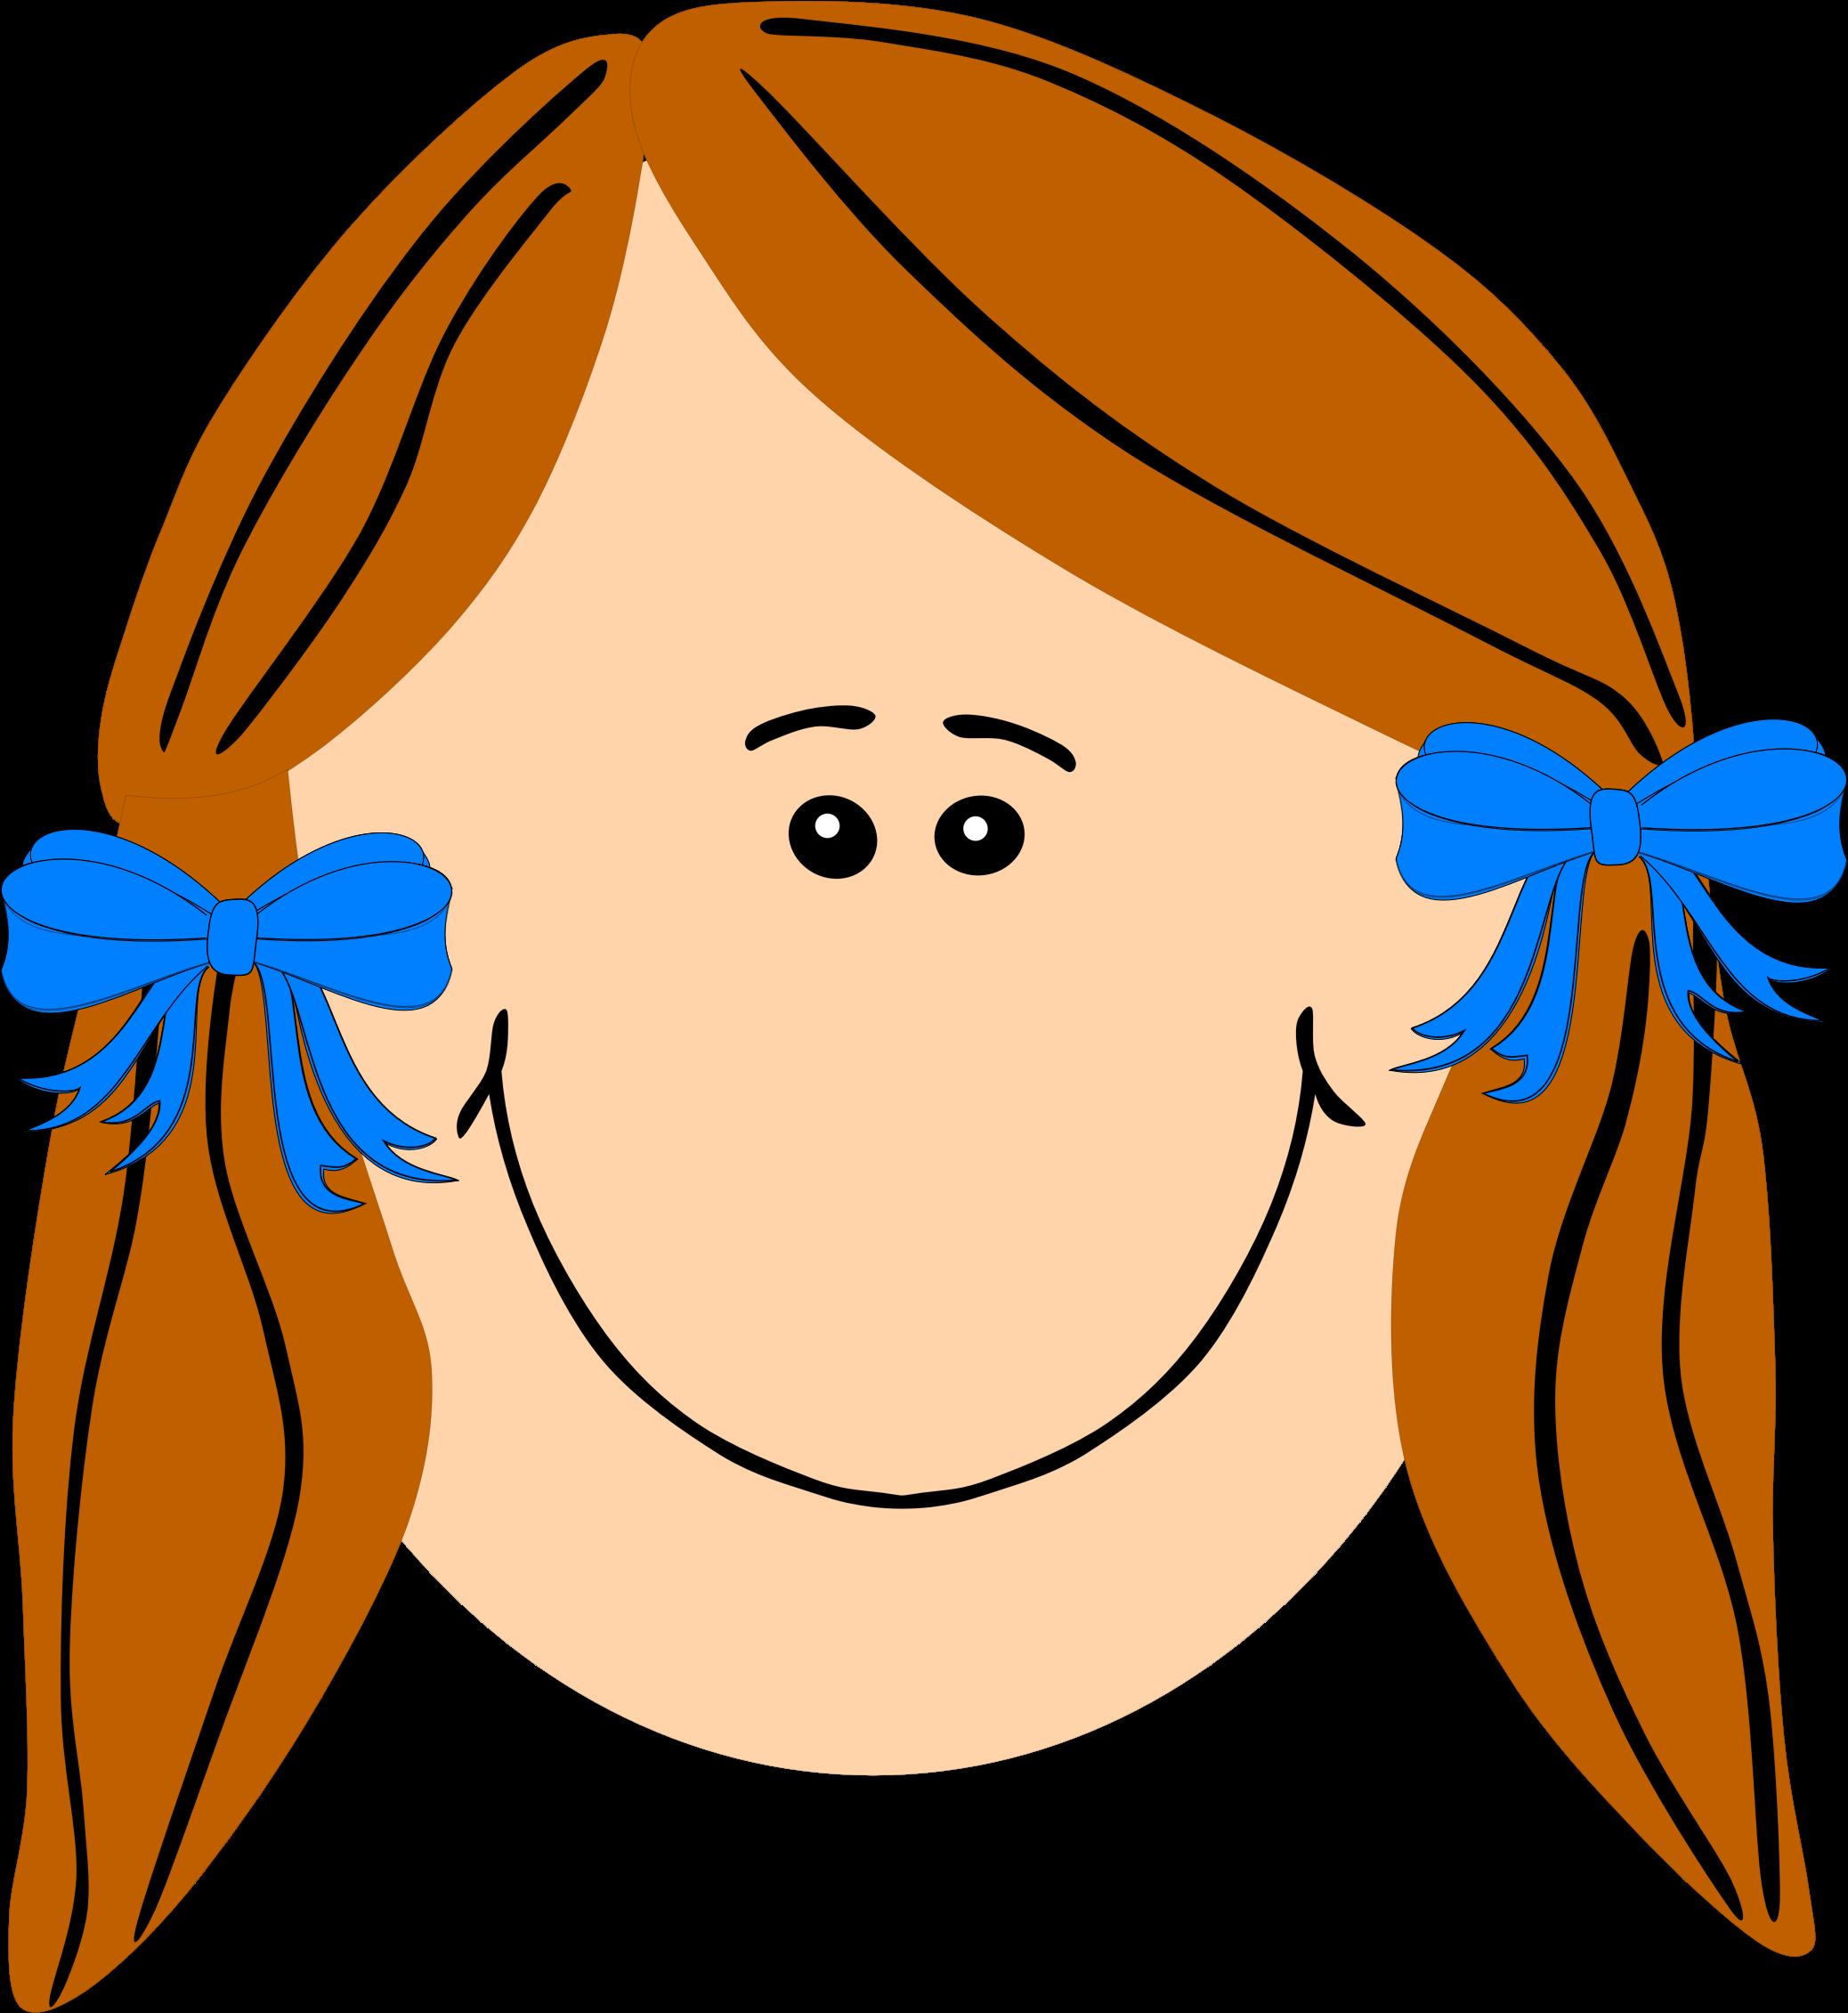 Face clipart girl vector royalty free stock Girls face clipart 4 » Clipart Station vector royalty free stock